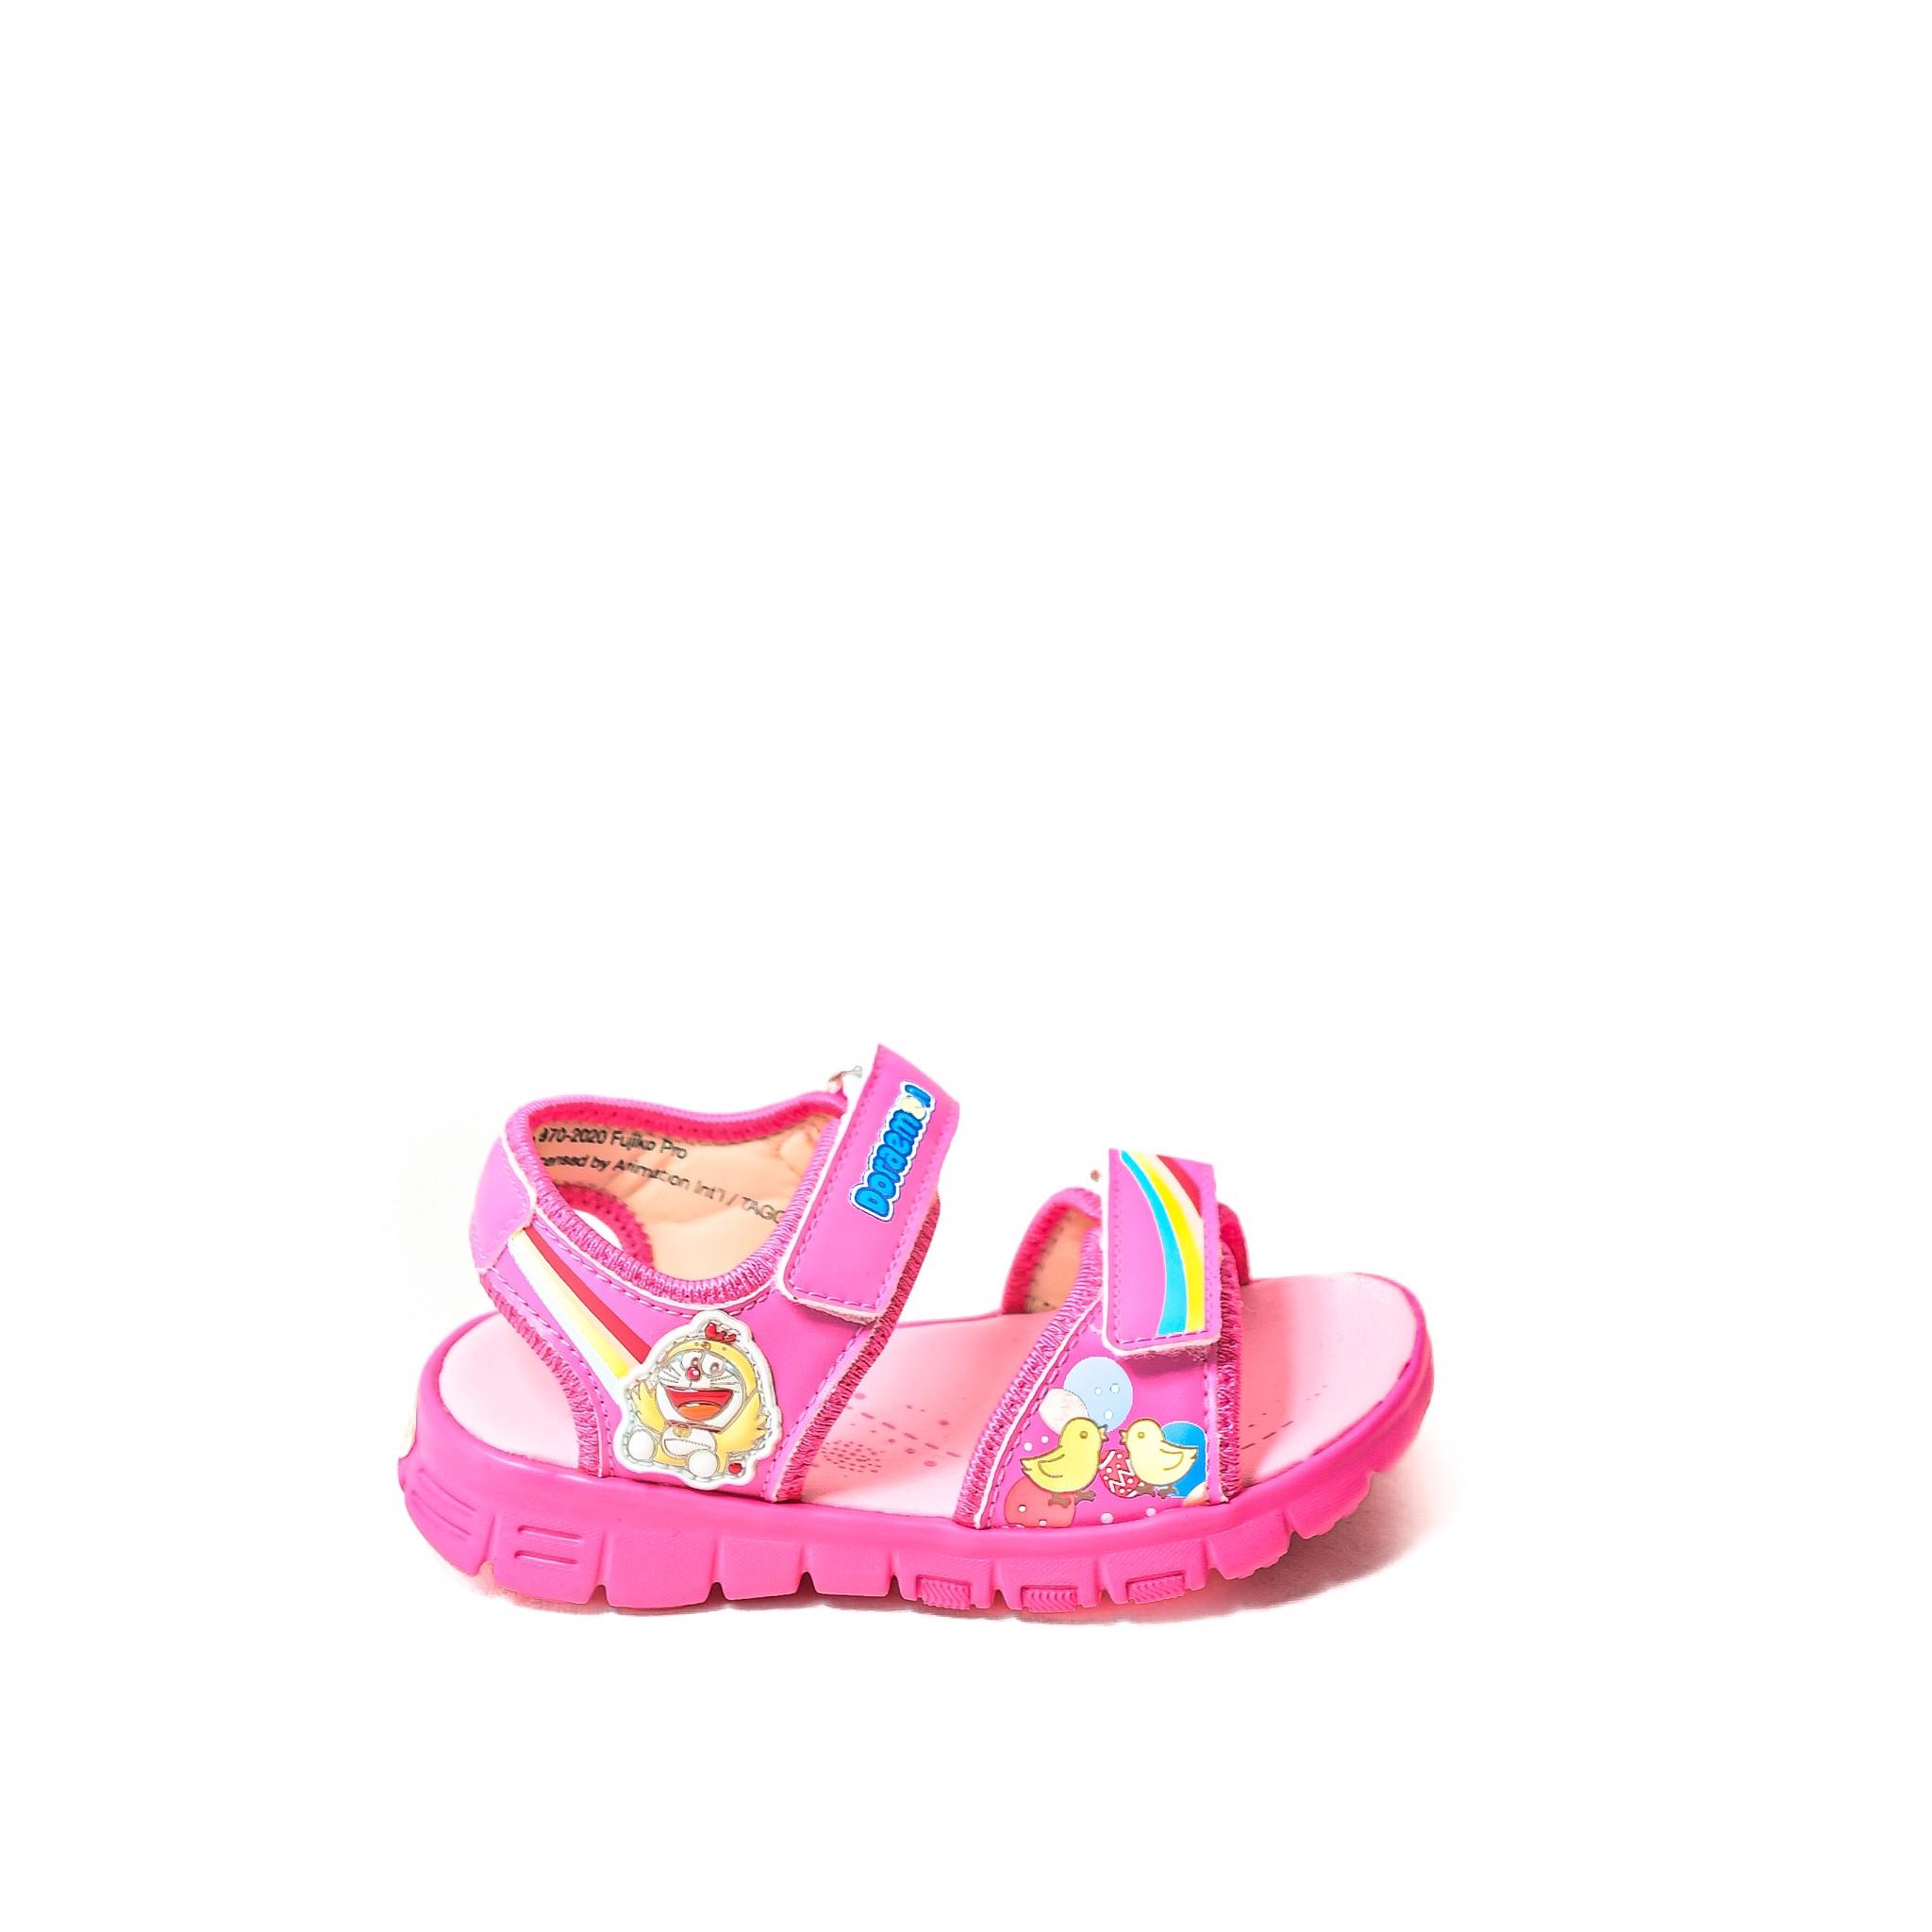 Sandal Bitis bé gái (size 24-30)